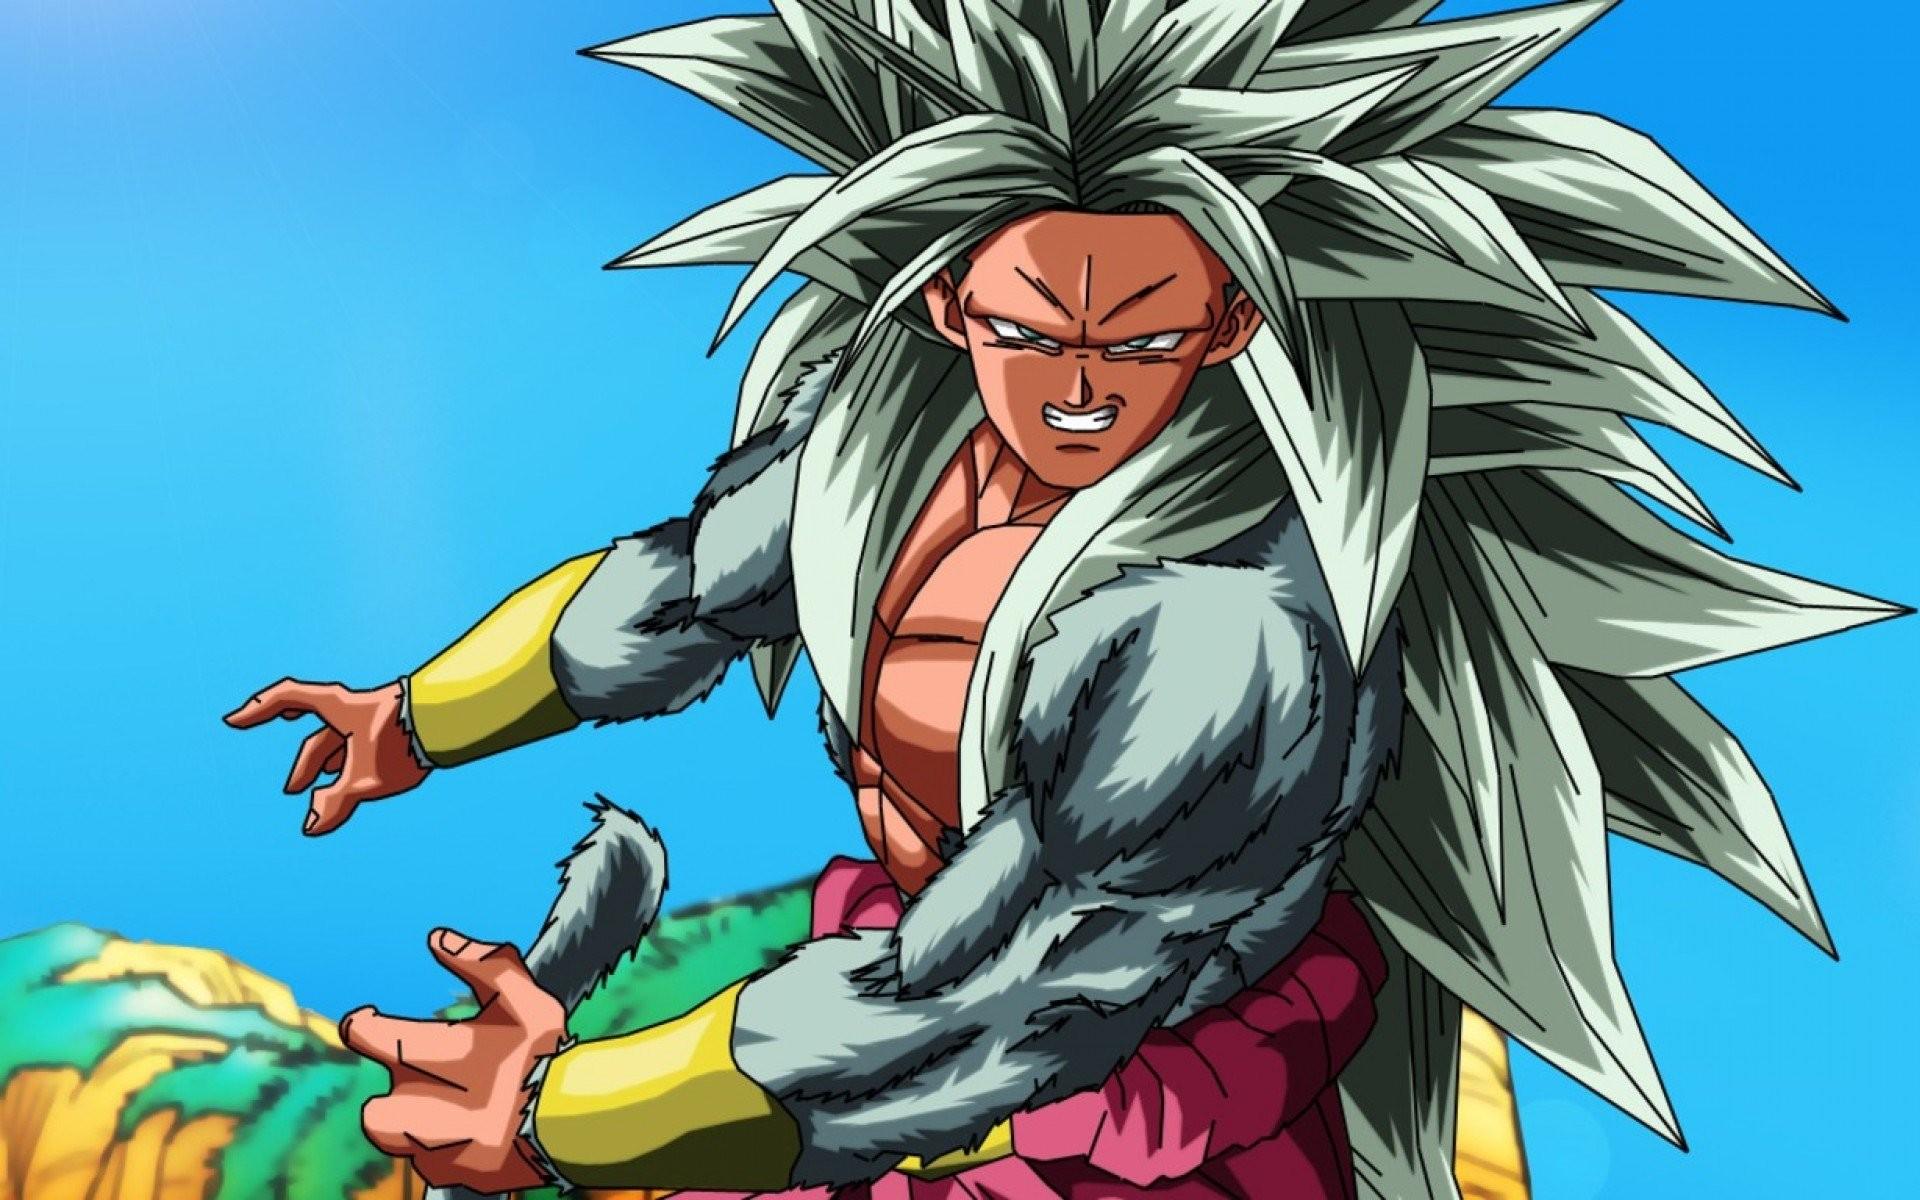 Broly Super Saiyan 5